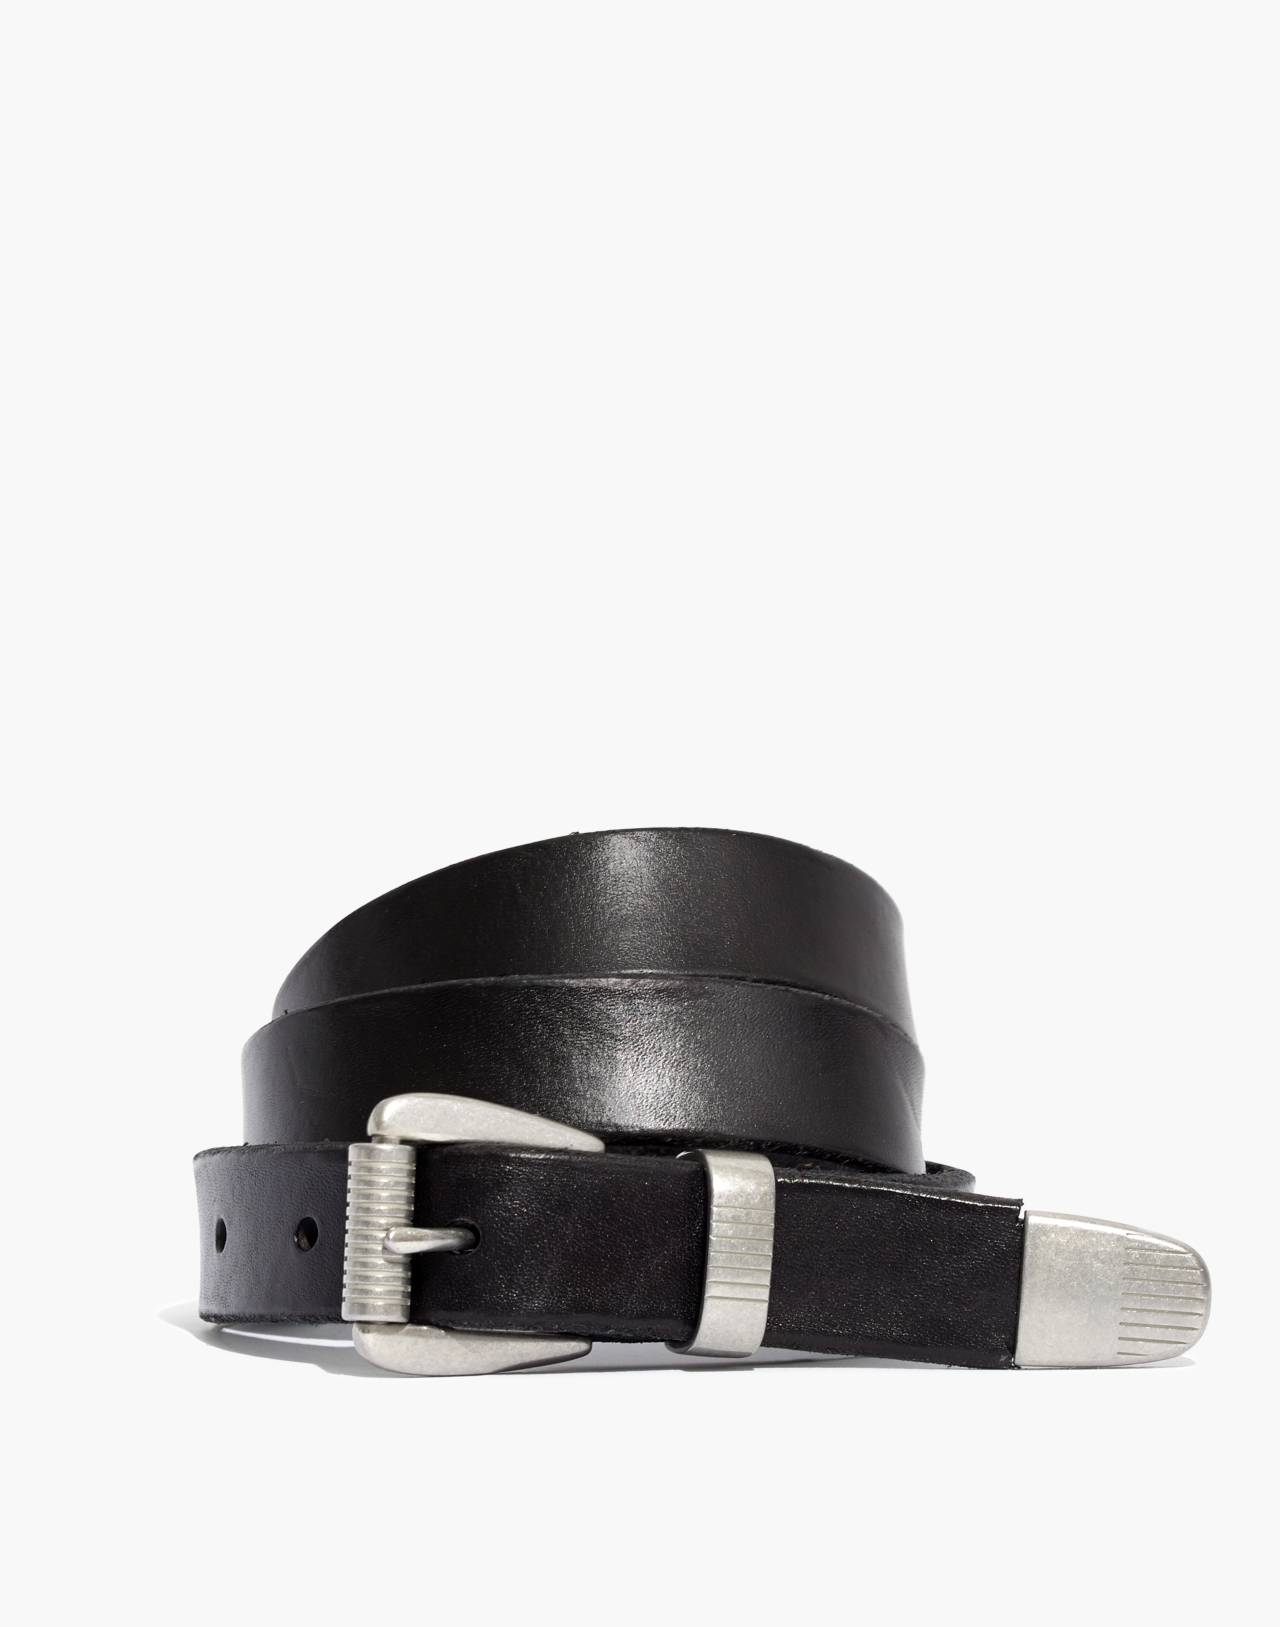 Leather Three-Piece Belt in true black image 1